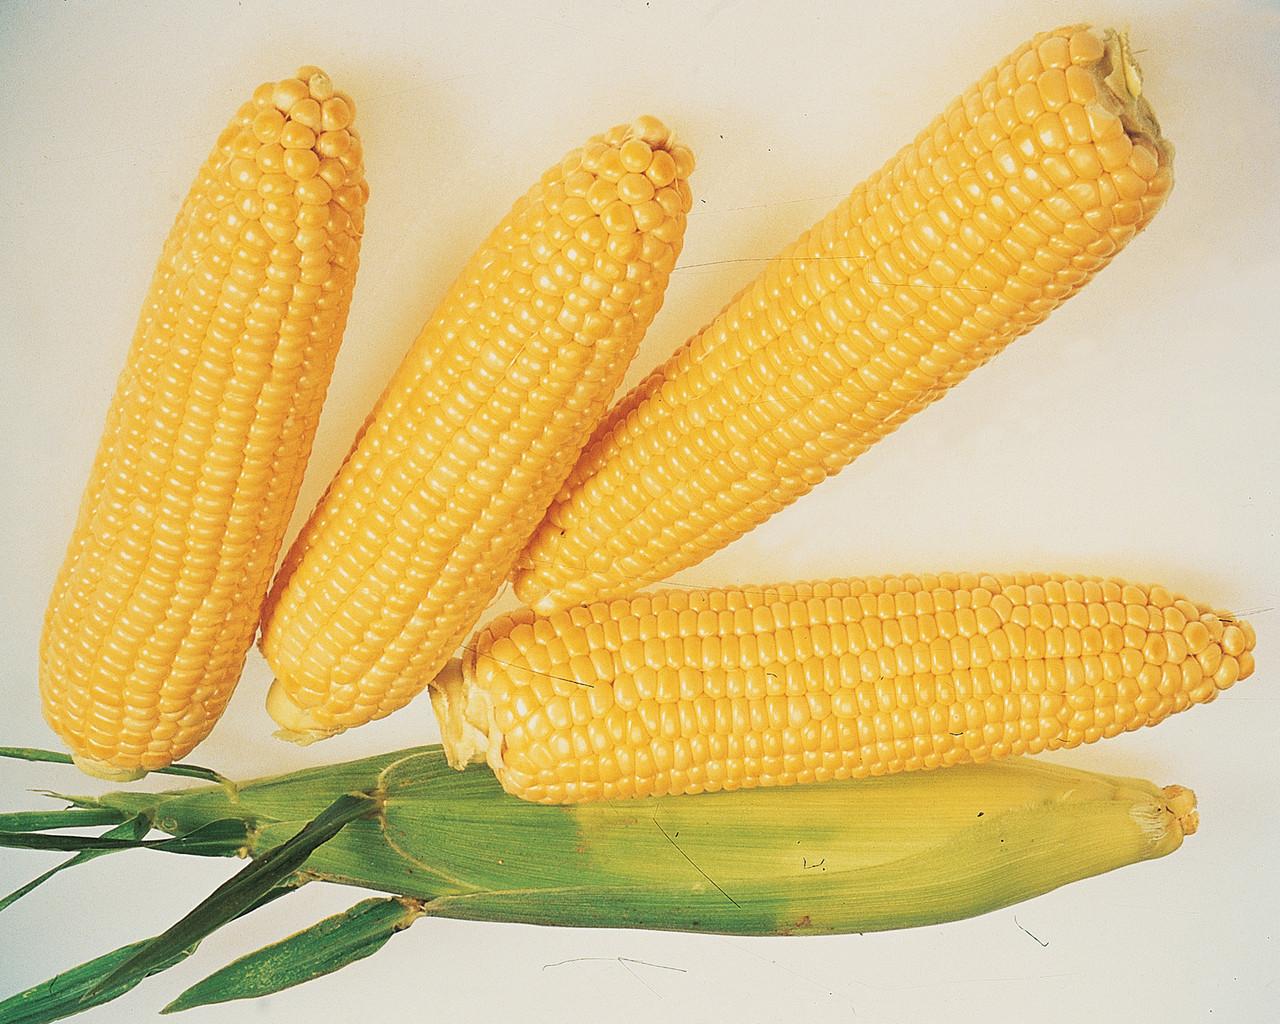 кукуруза сахарная картинки работодателю будет